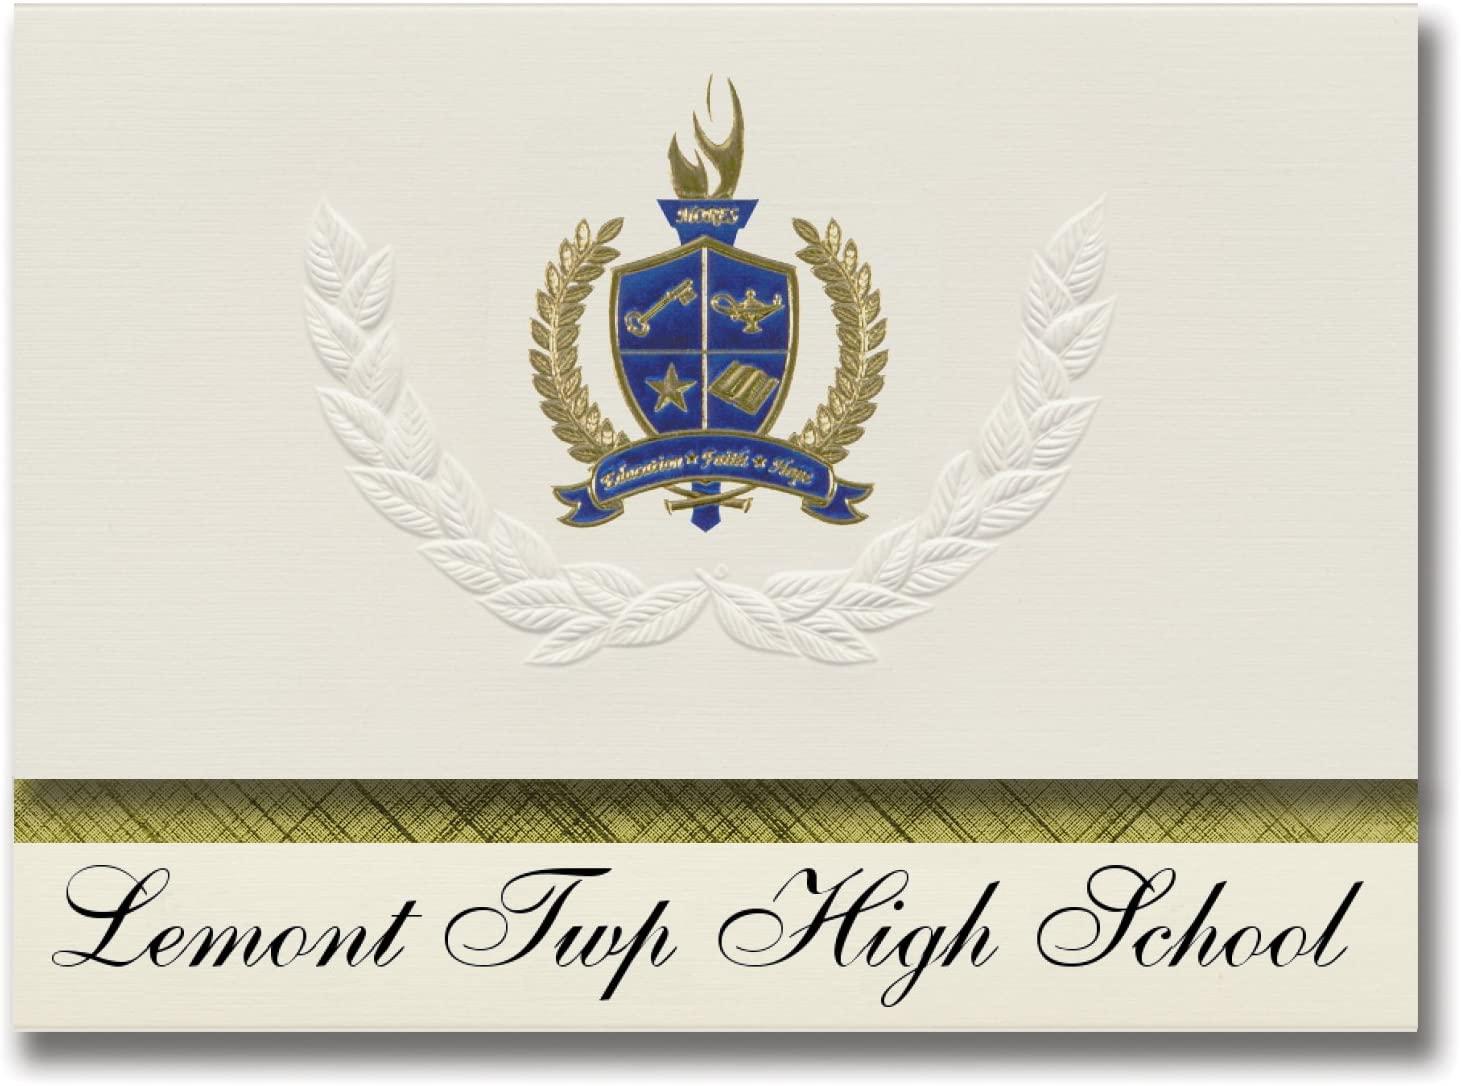 Signature Announcements Lemont Twp High School (Lemont, IL) Graduation Announcements, Presidential style, Elite package of 25 with Gold & Blue Metallic Foil seal